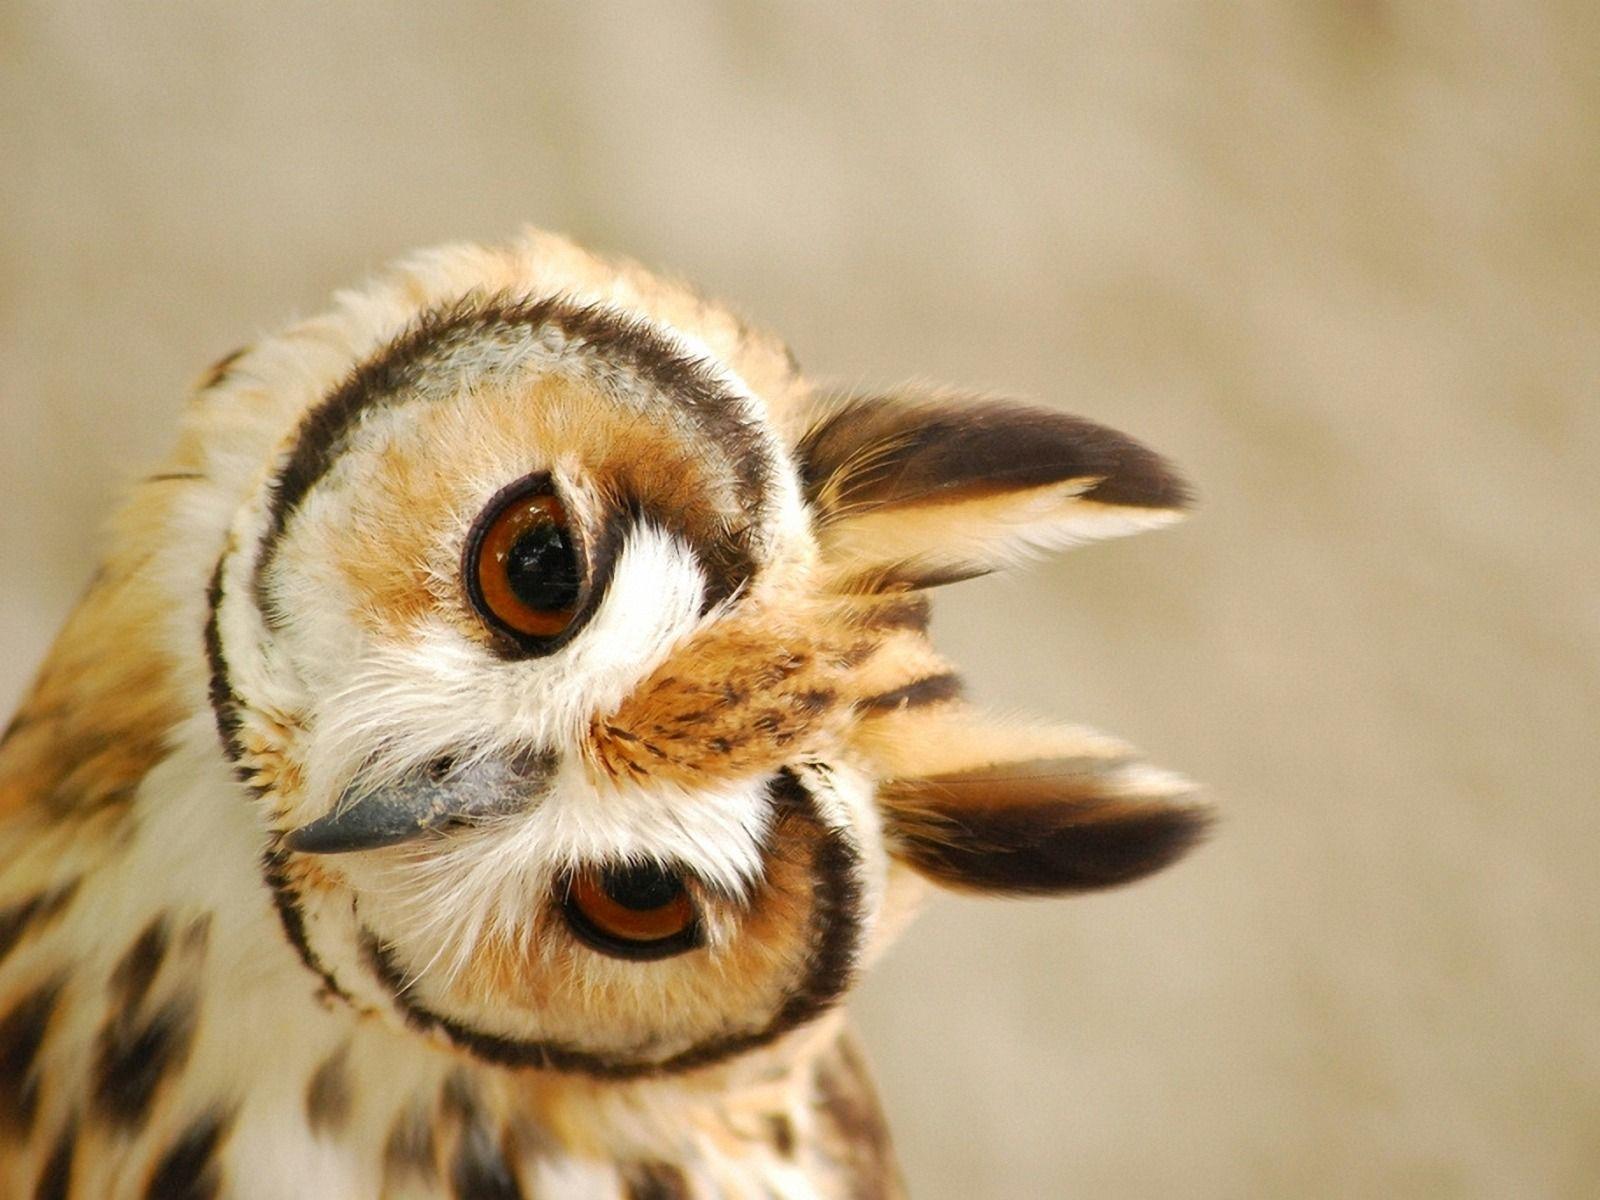 cute owl pictures wallpaper desktop background 1600x1200px wallpaper cute owl 60430